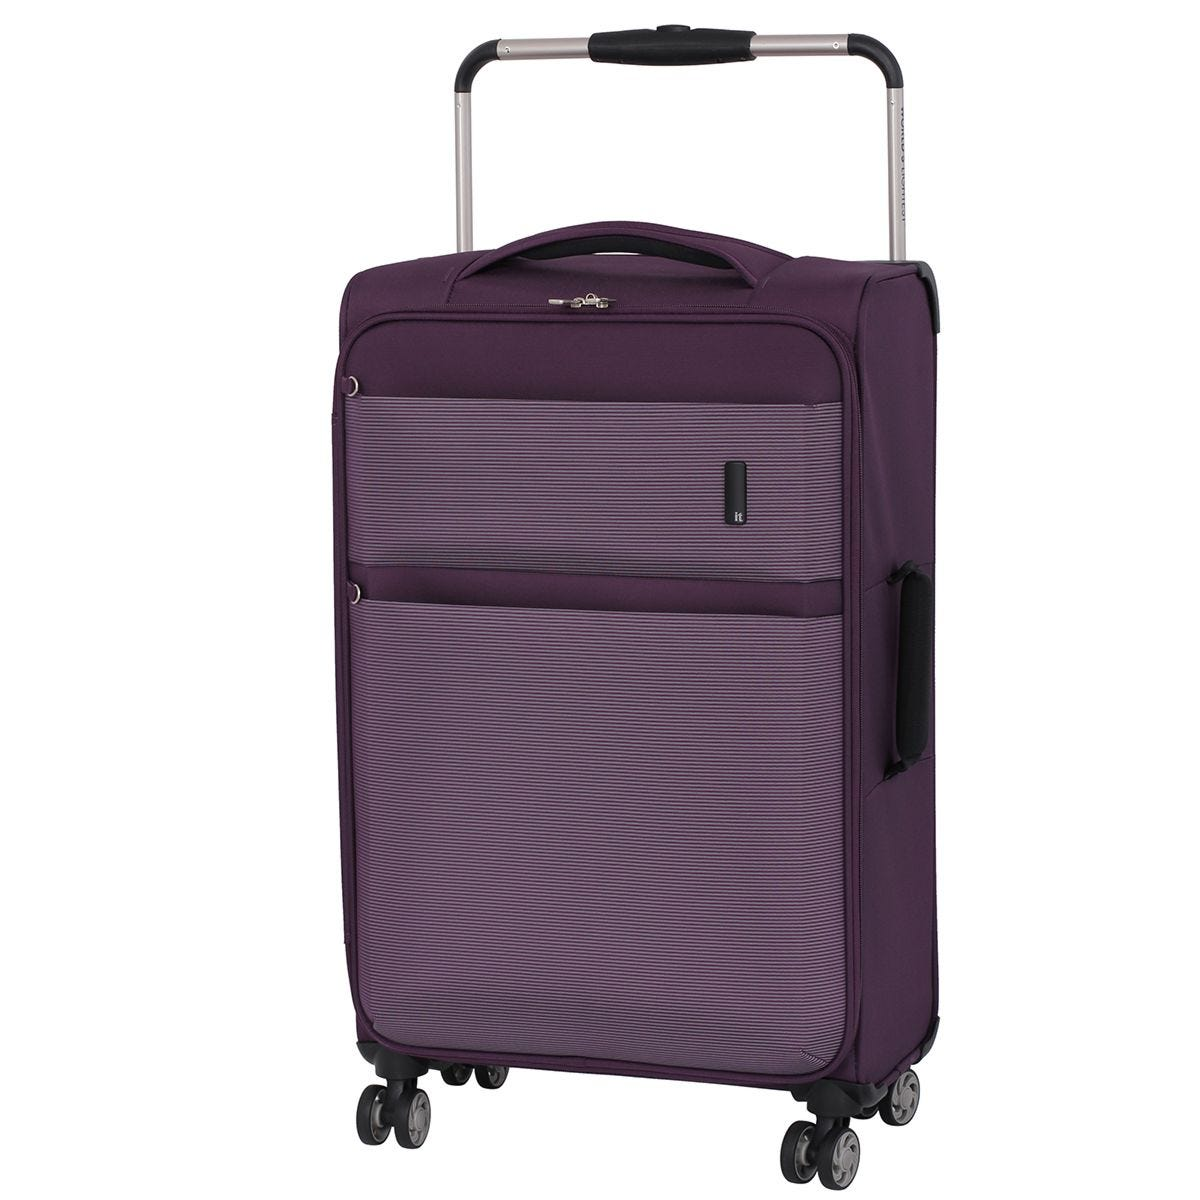 It Luggage Debonair World's Lightest Wide Handled Design 8-Wheel Medium Case - Purple/White